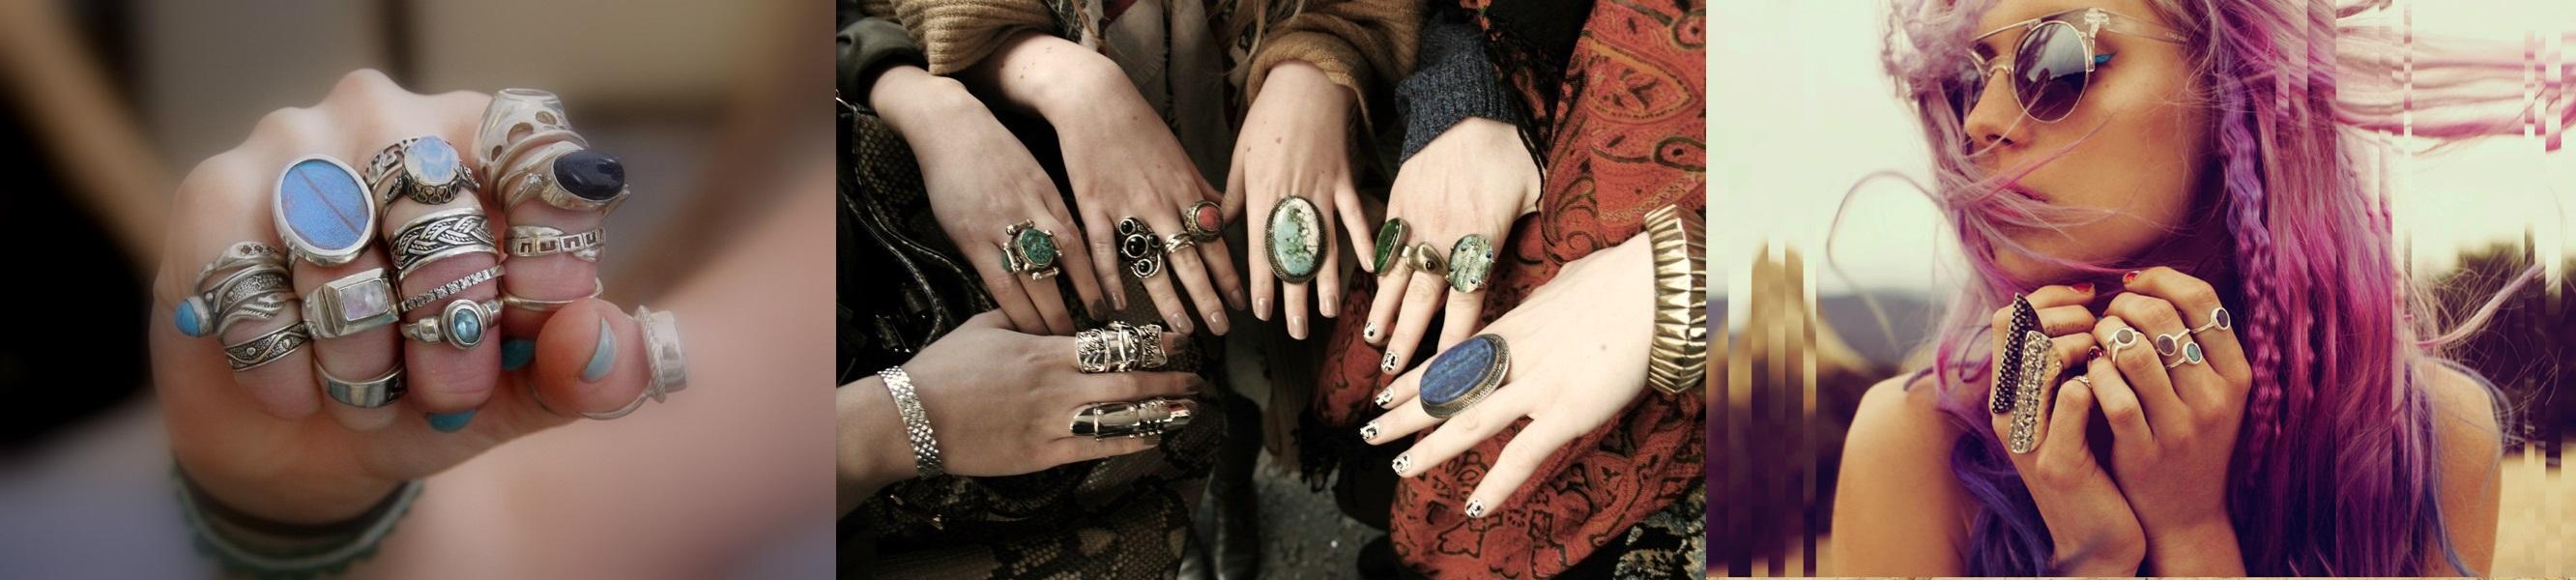 Какие кольца в моде 2018 фото